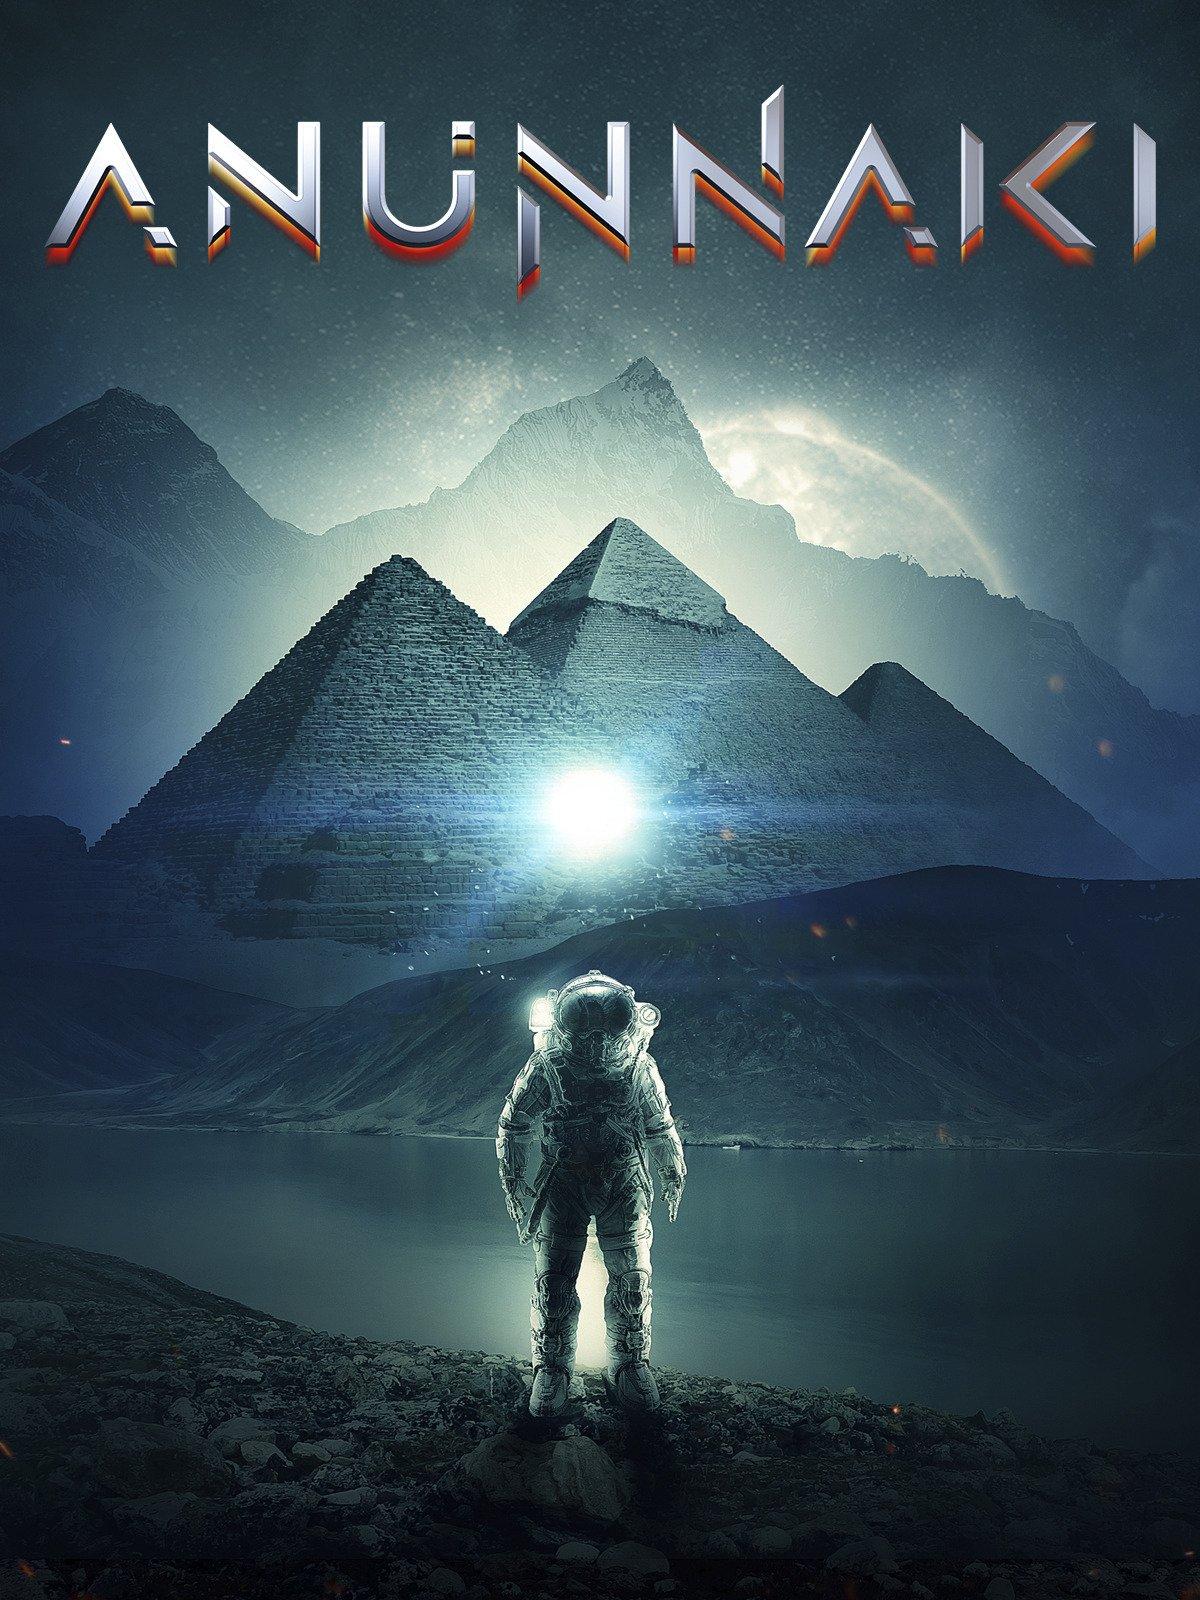 Film Tiruan 1 Anunnaki 2017